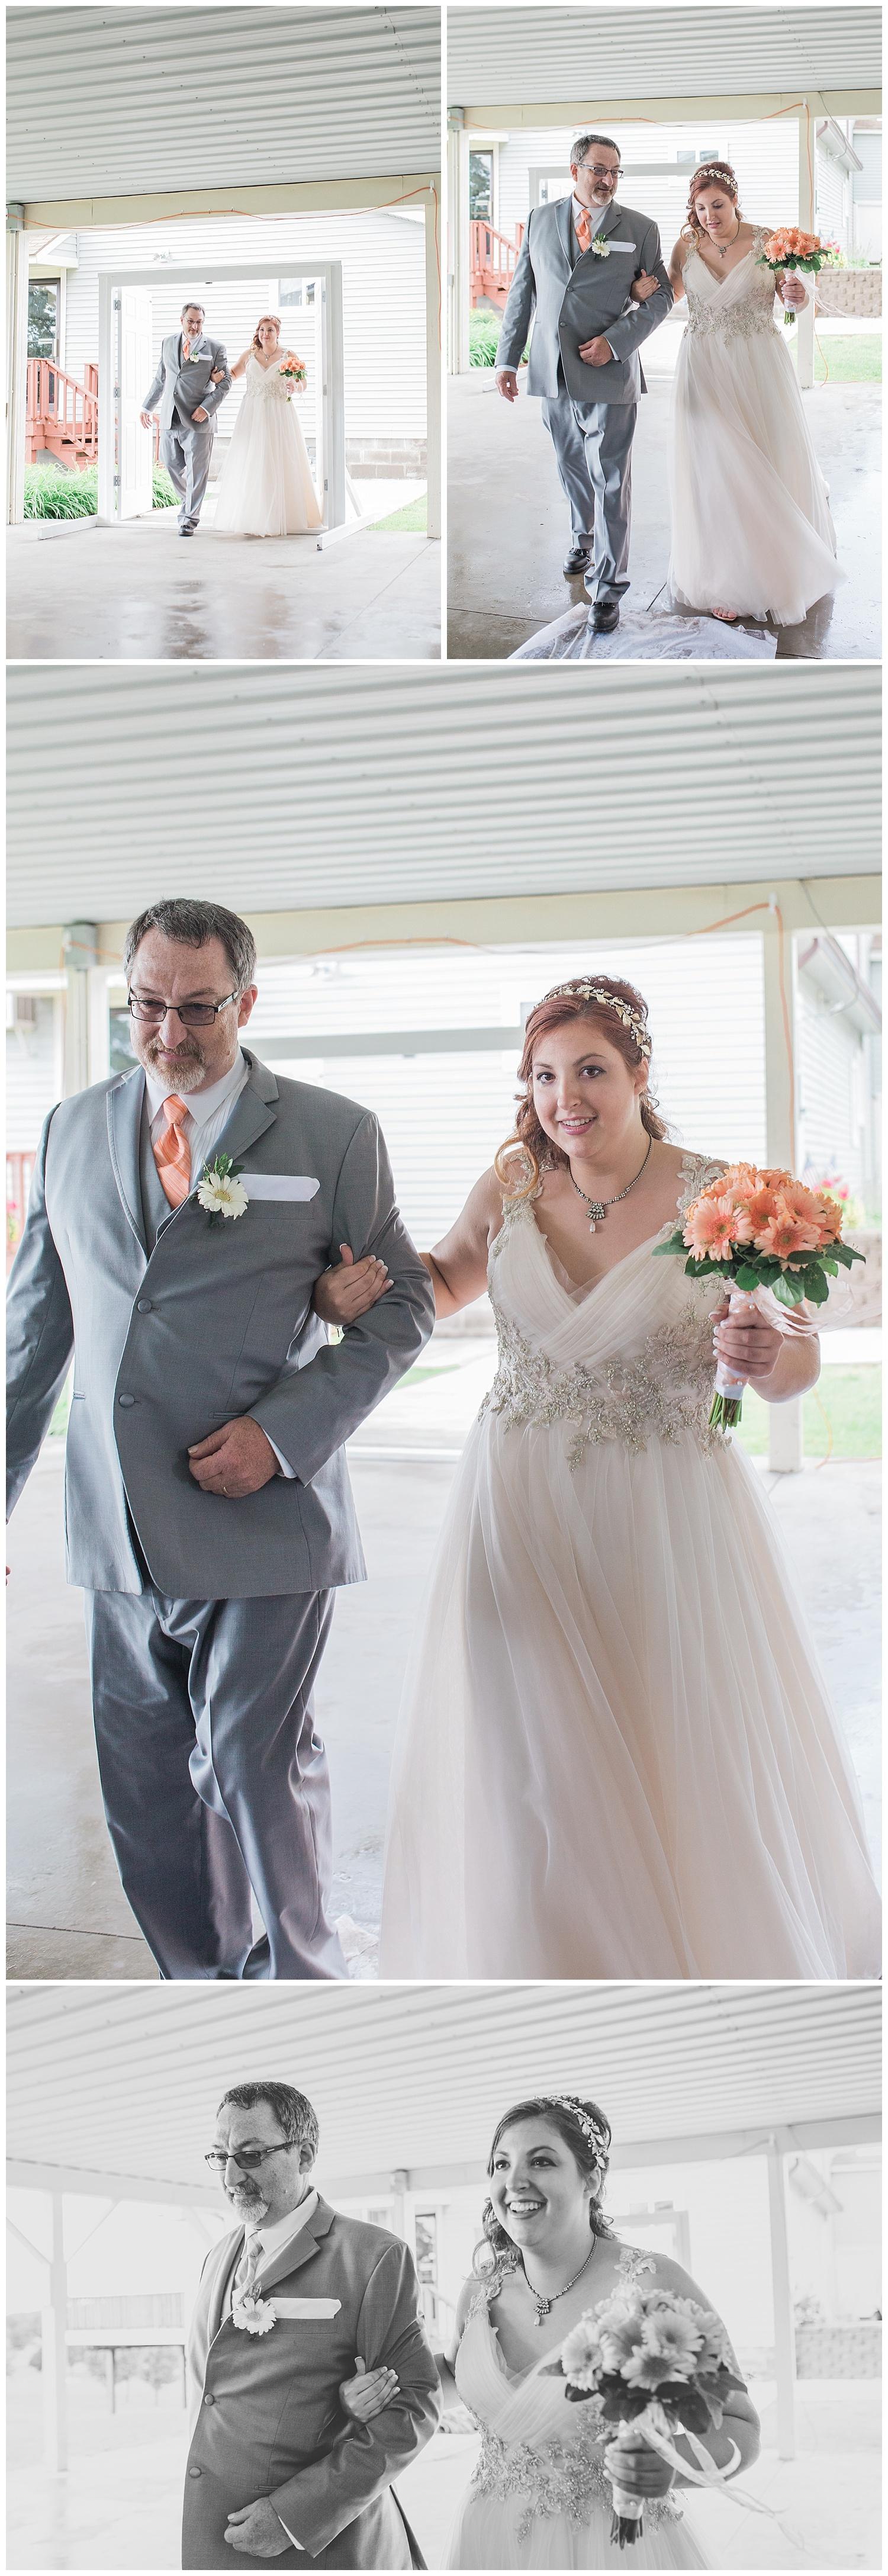 Brian and Molly Wed in Conesus NY - Lass & Beau-213_Buffalo wedding photography.jpg